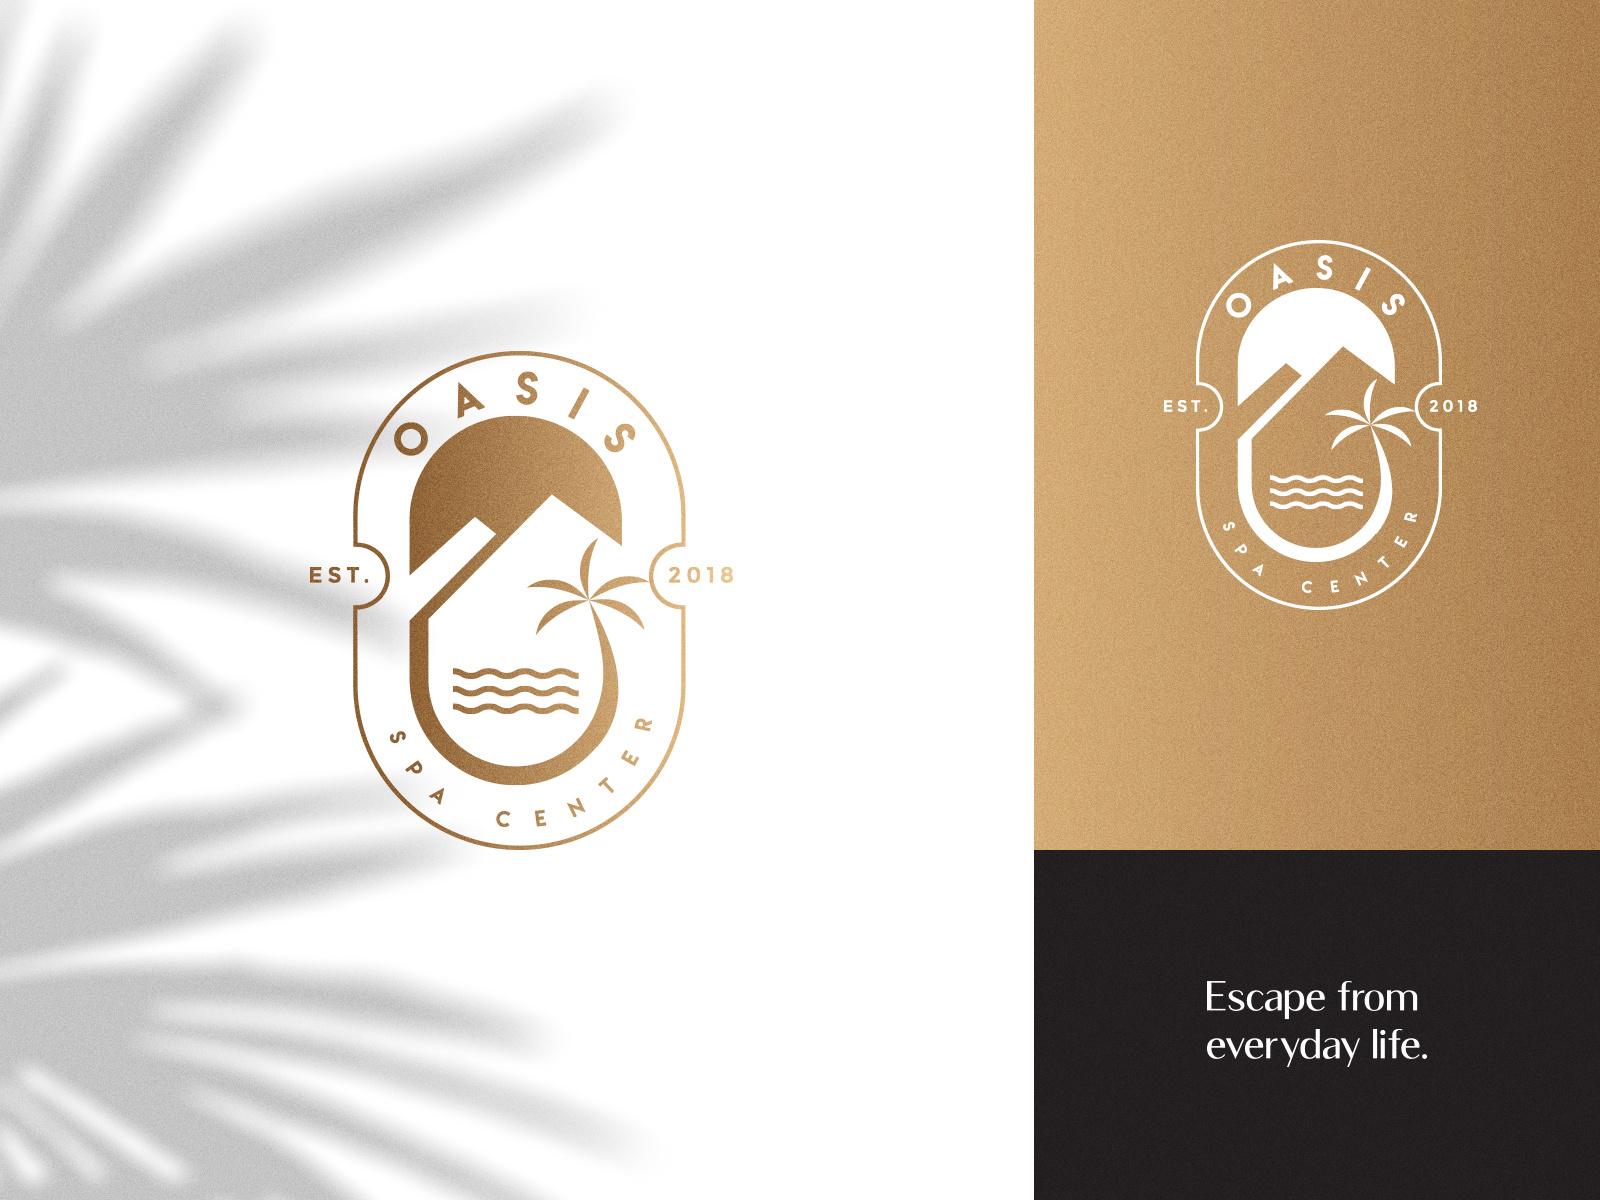 Oasis Spa Center logo by Danilo Mitrovic on Dribbble.